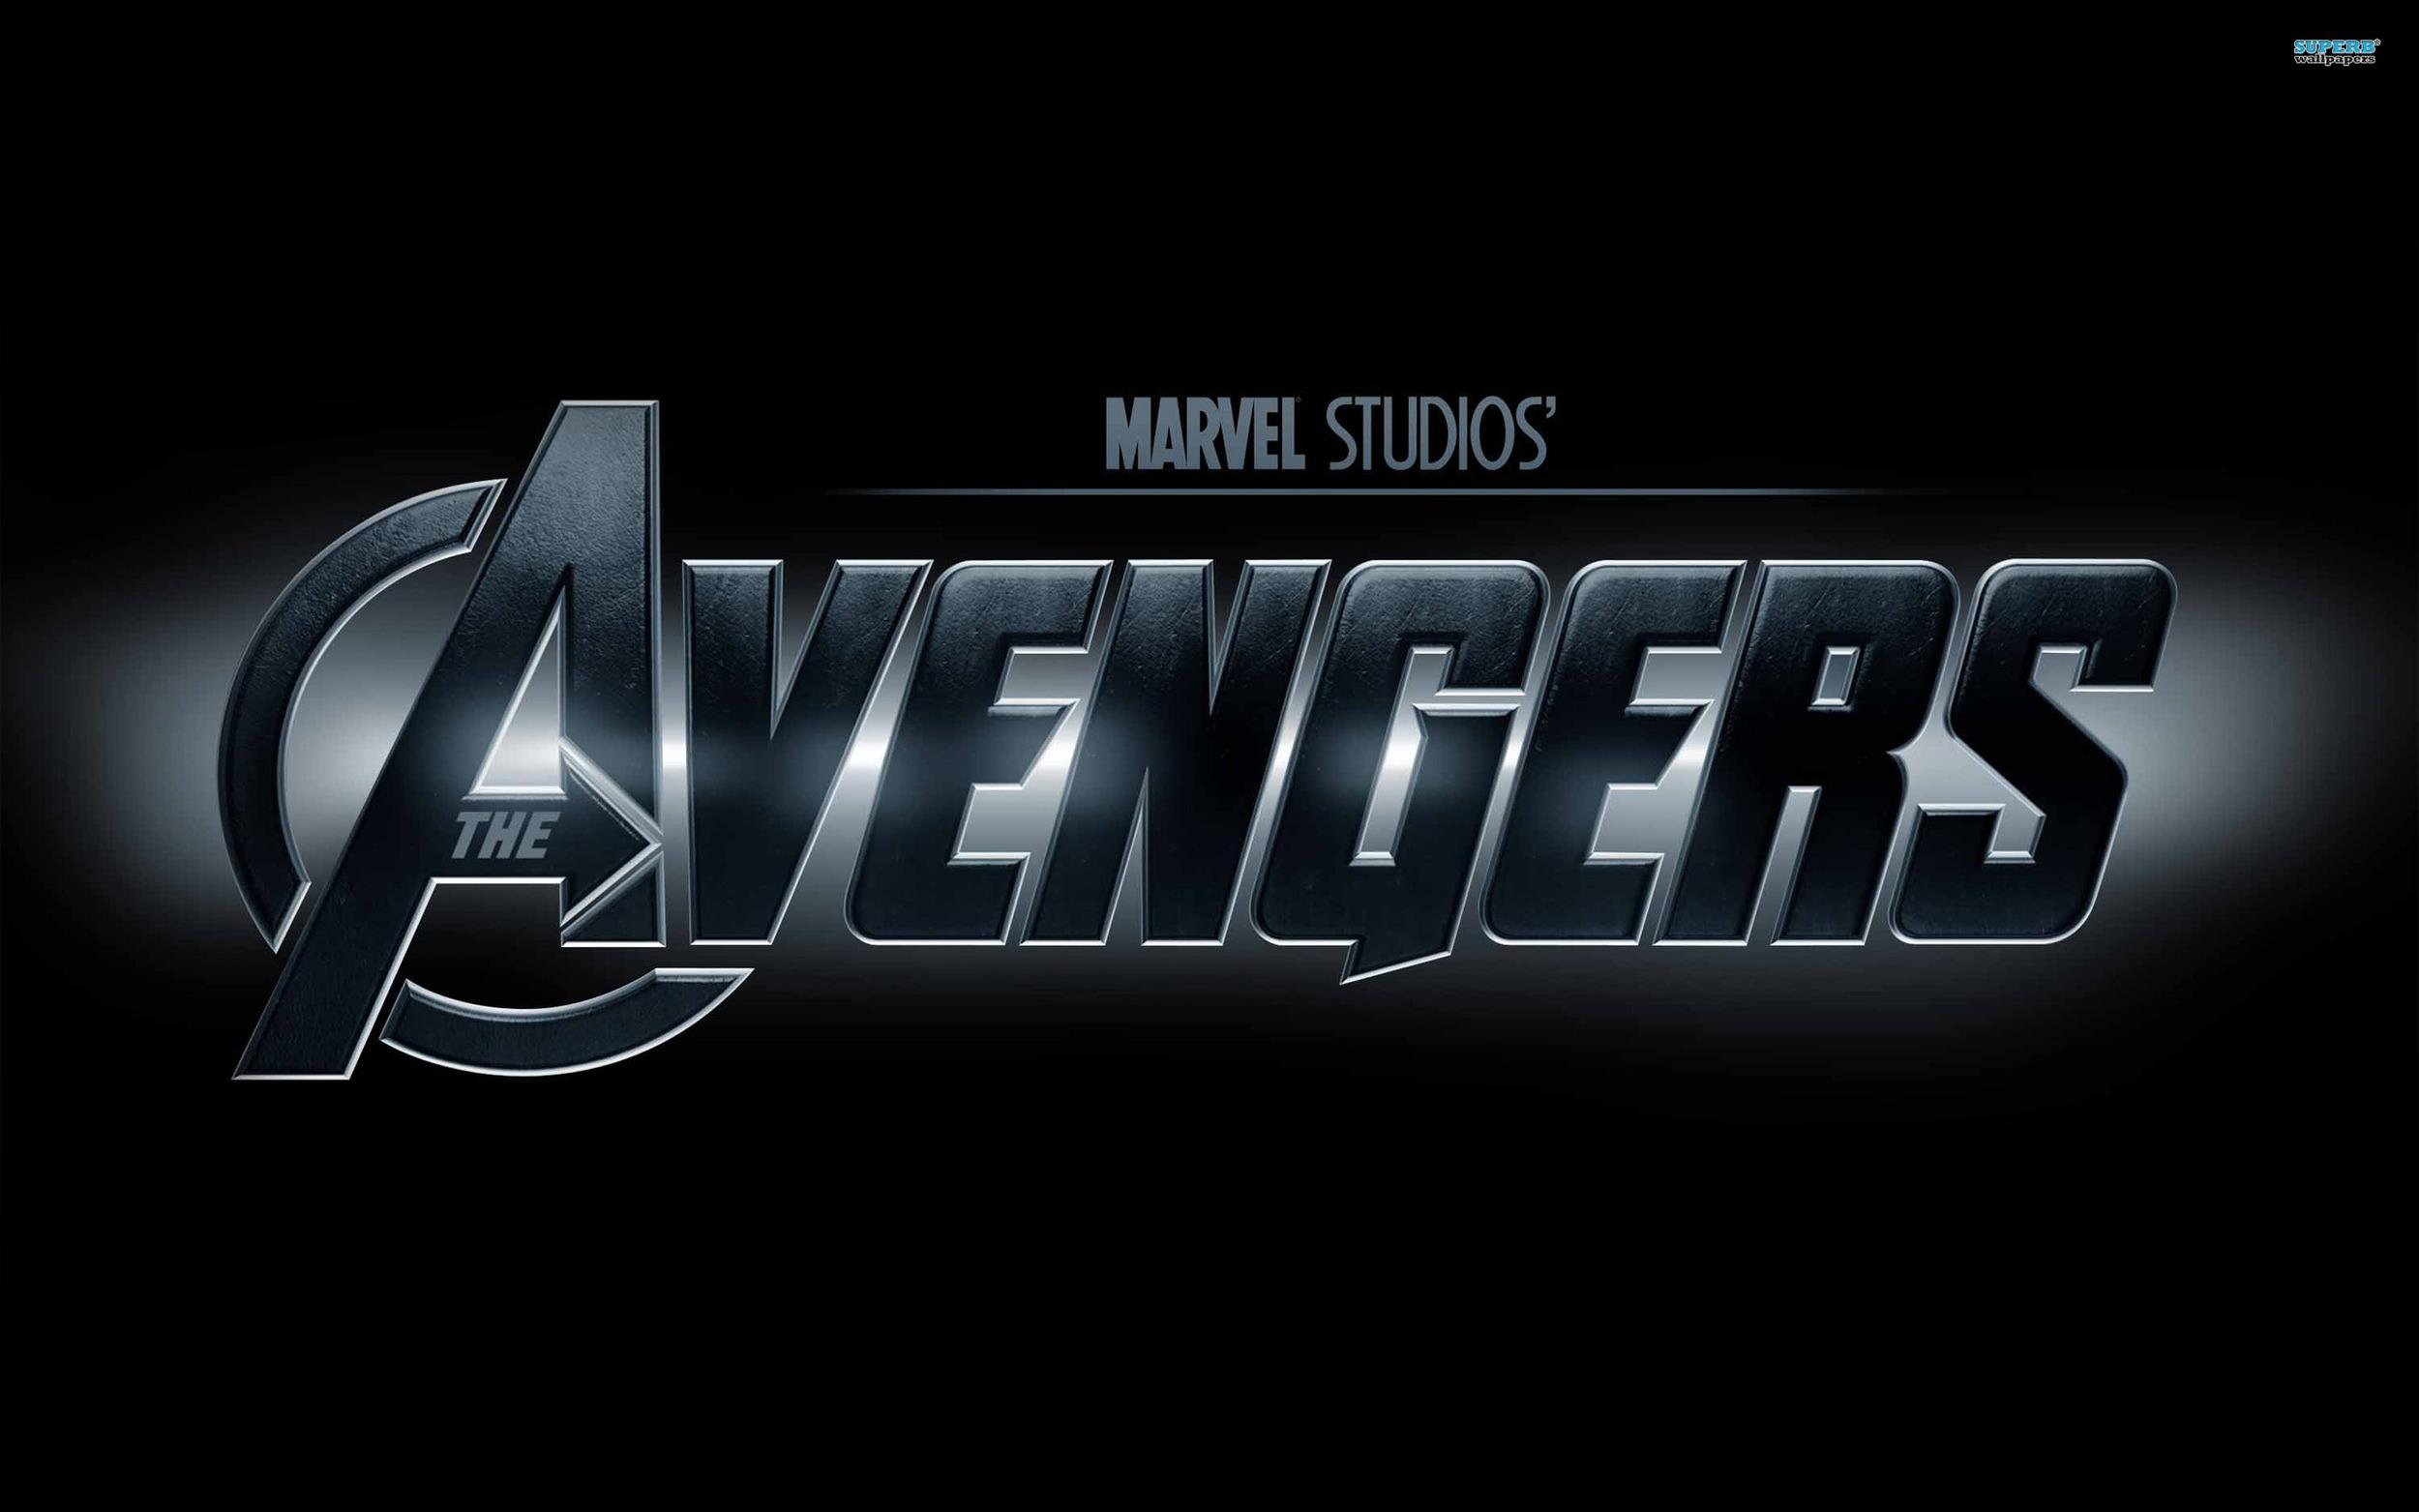 The-Avengers-Logo-Hd-5.jpg